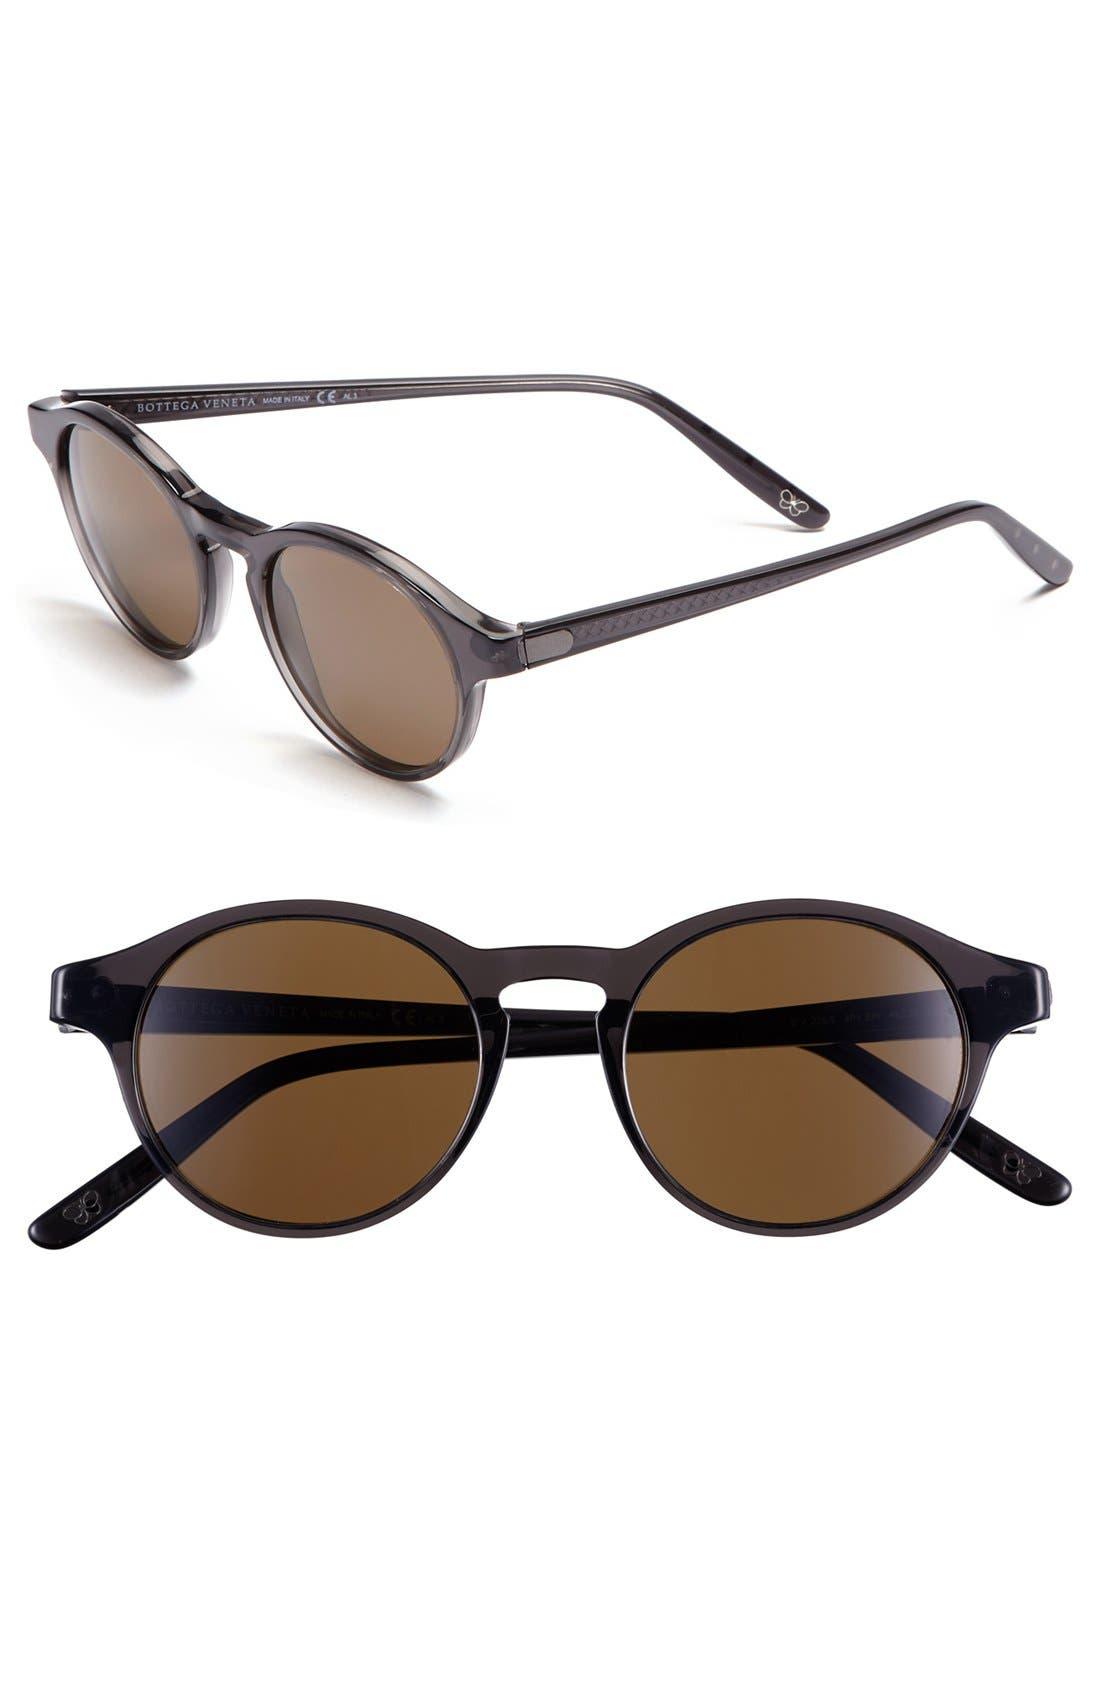 Alternate Image 1 Selected - Bottega Veneta 49mm Retro Sunglasses